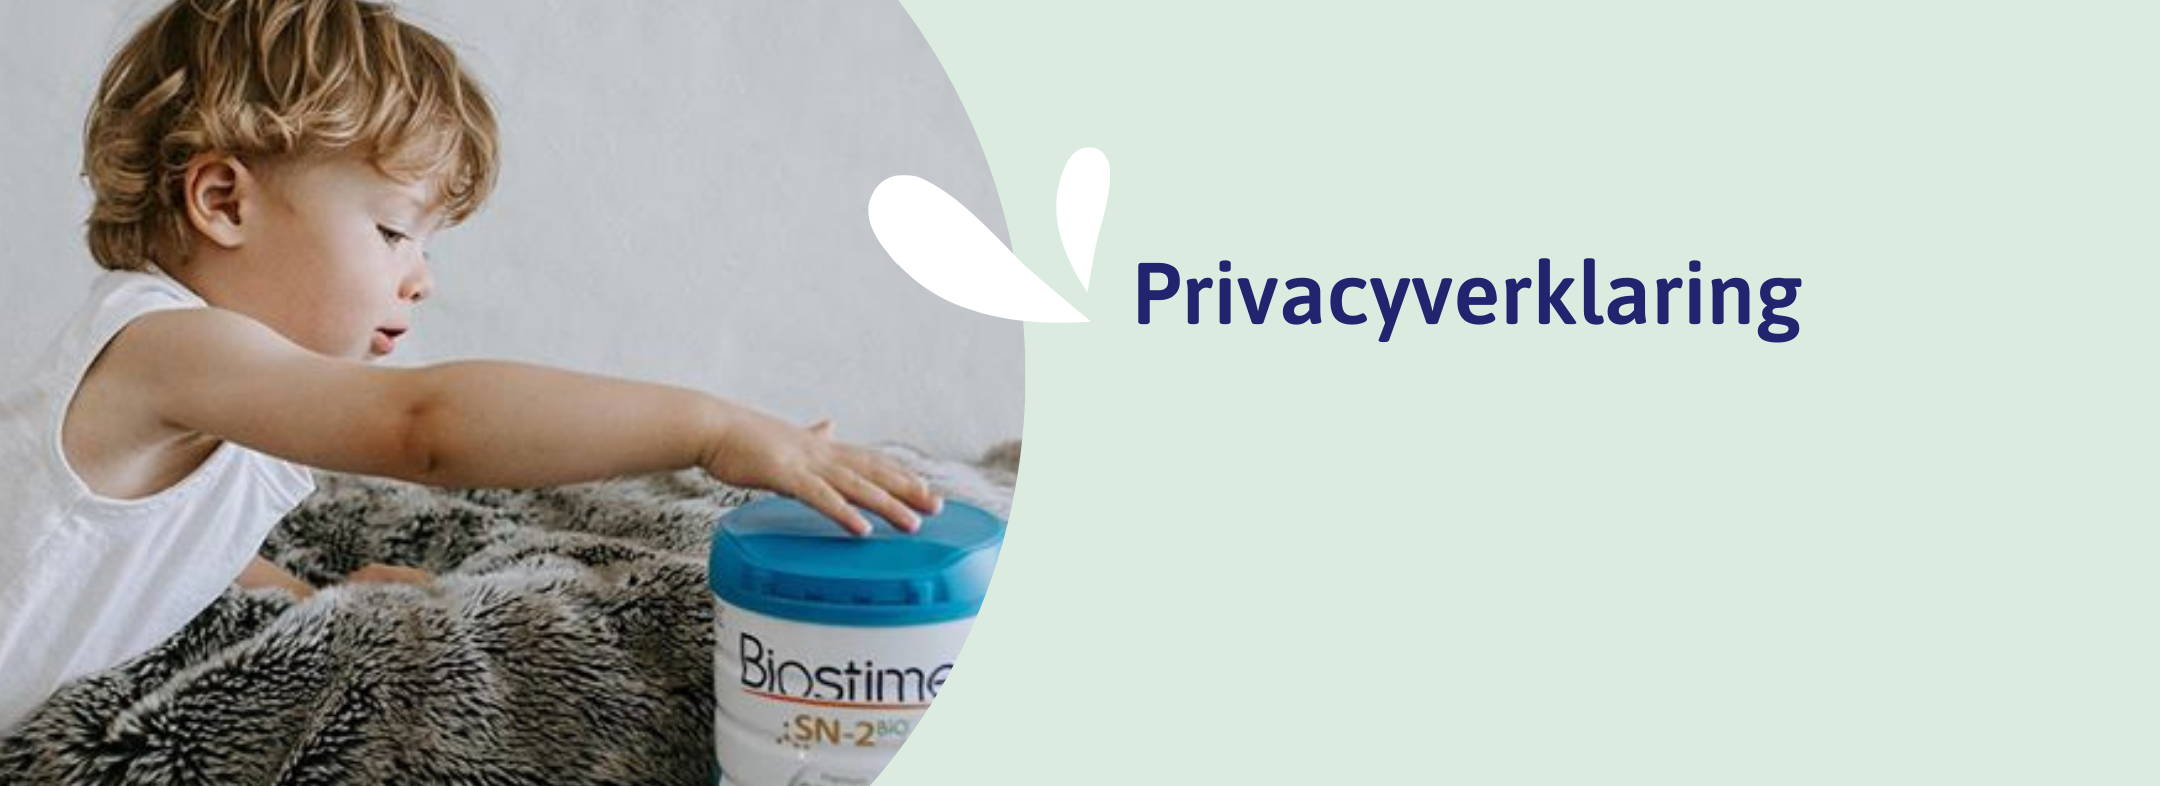 Biostime privacyverklaring